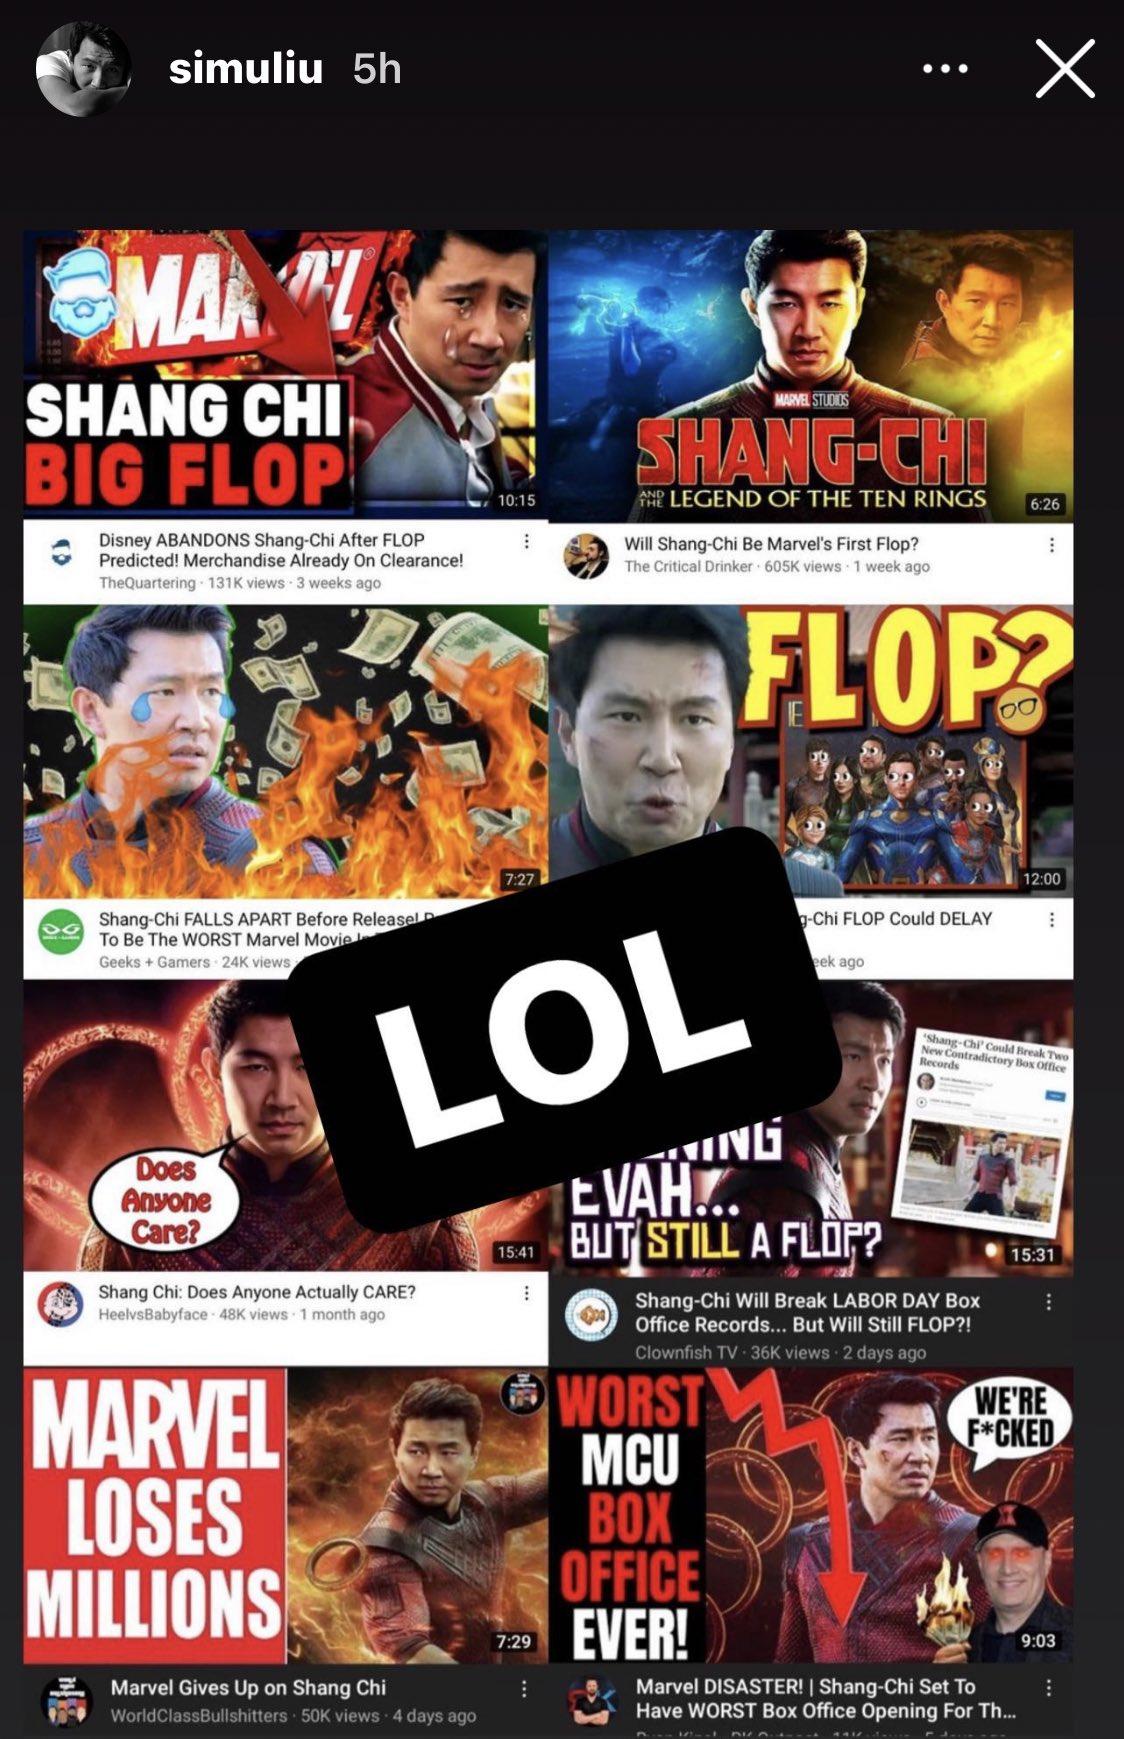 Simu Liu 'Shang-Chi and the Legend of the Ten Rings